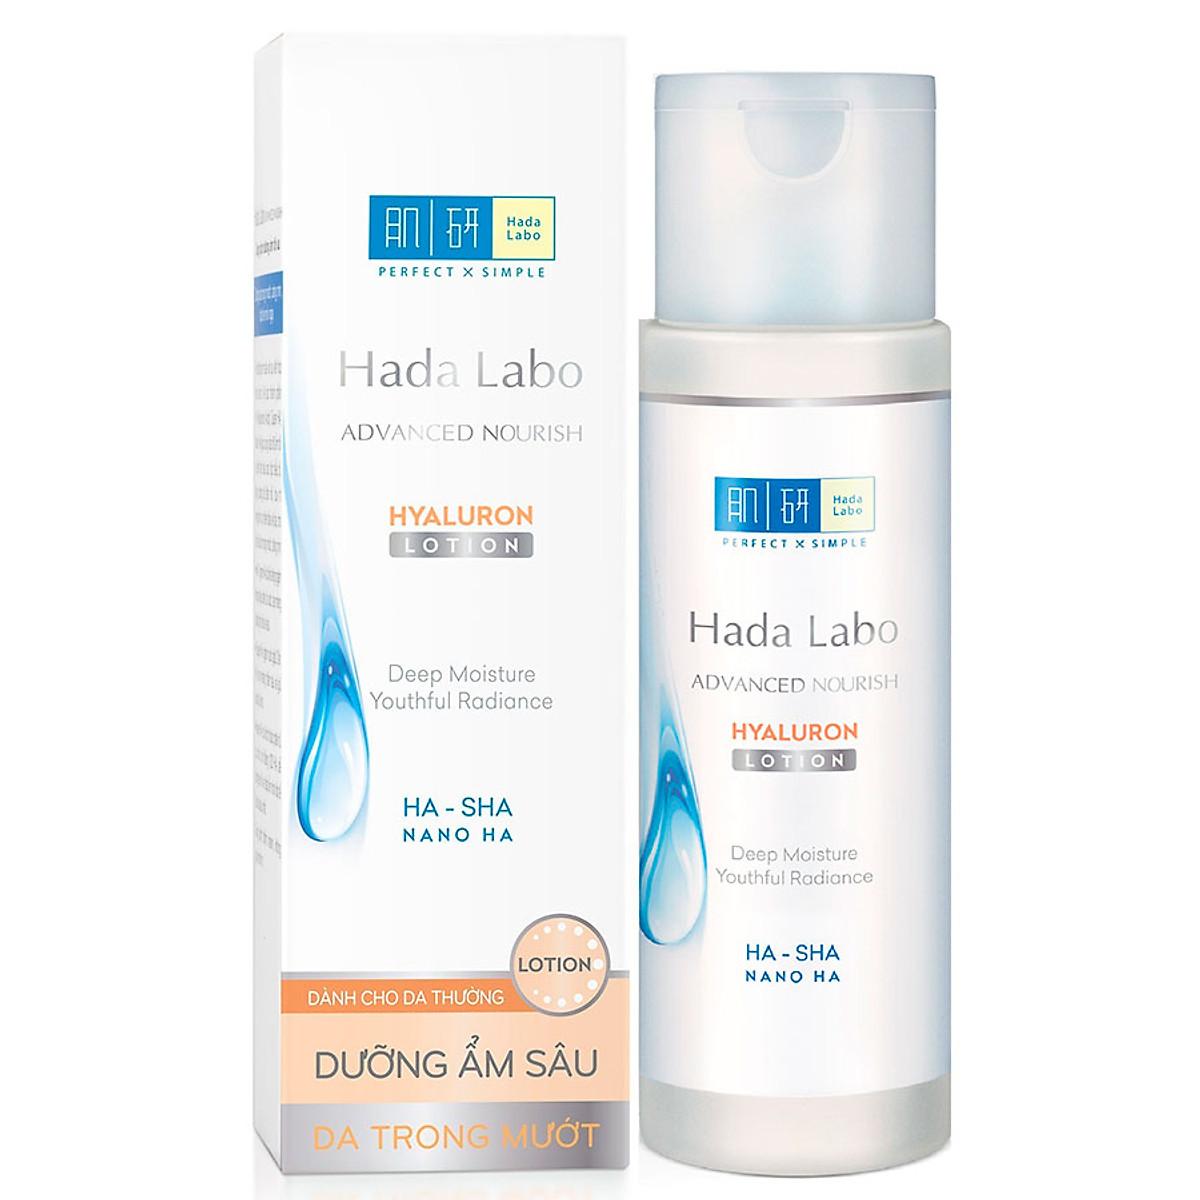 sua-duong-hada-labo-advanced-nourish-hyaluron-lotion-normal-skin-review-thanh-phan-gia-cong-dung-66